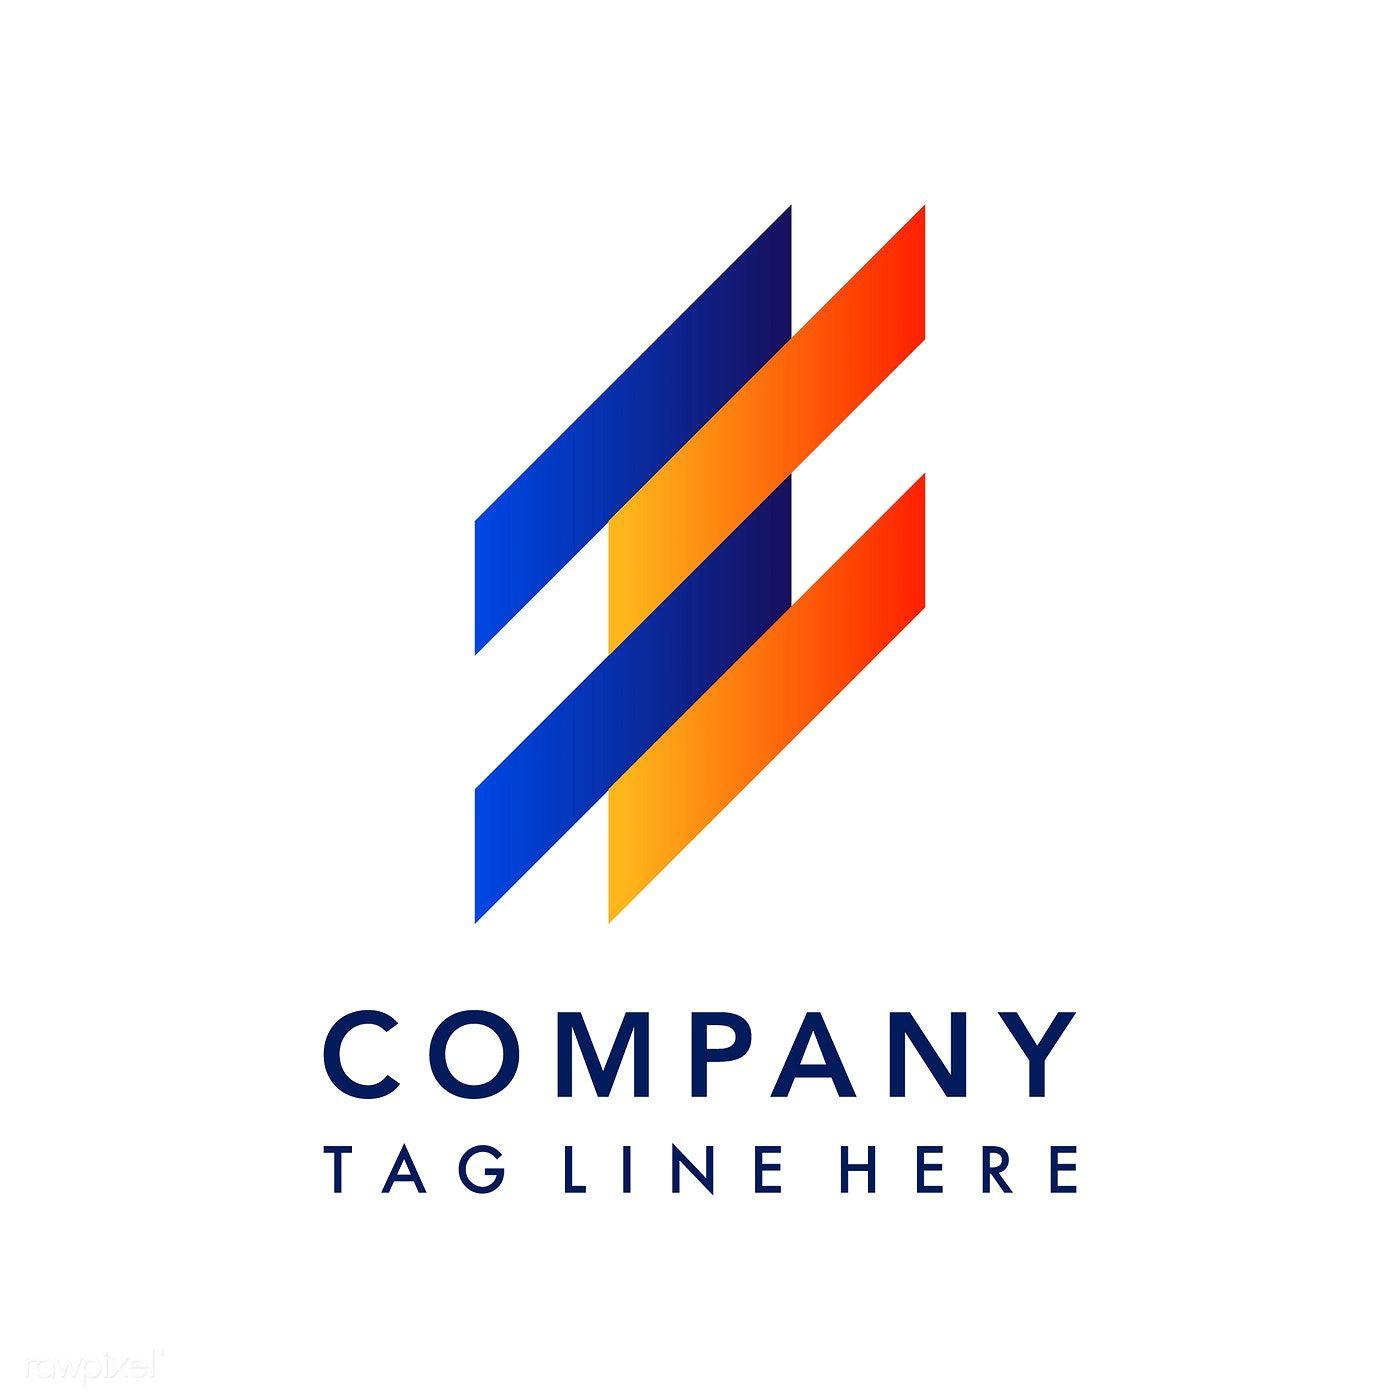 Download Premium Vector Of Modern Company Logo Design Vector 495807 Company Logo Design Logos Design Company Logo